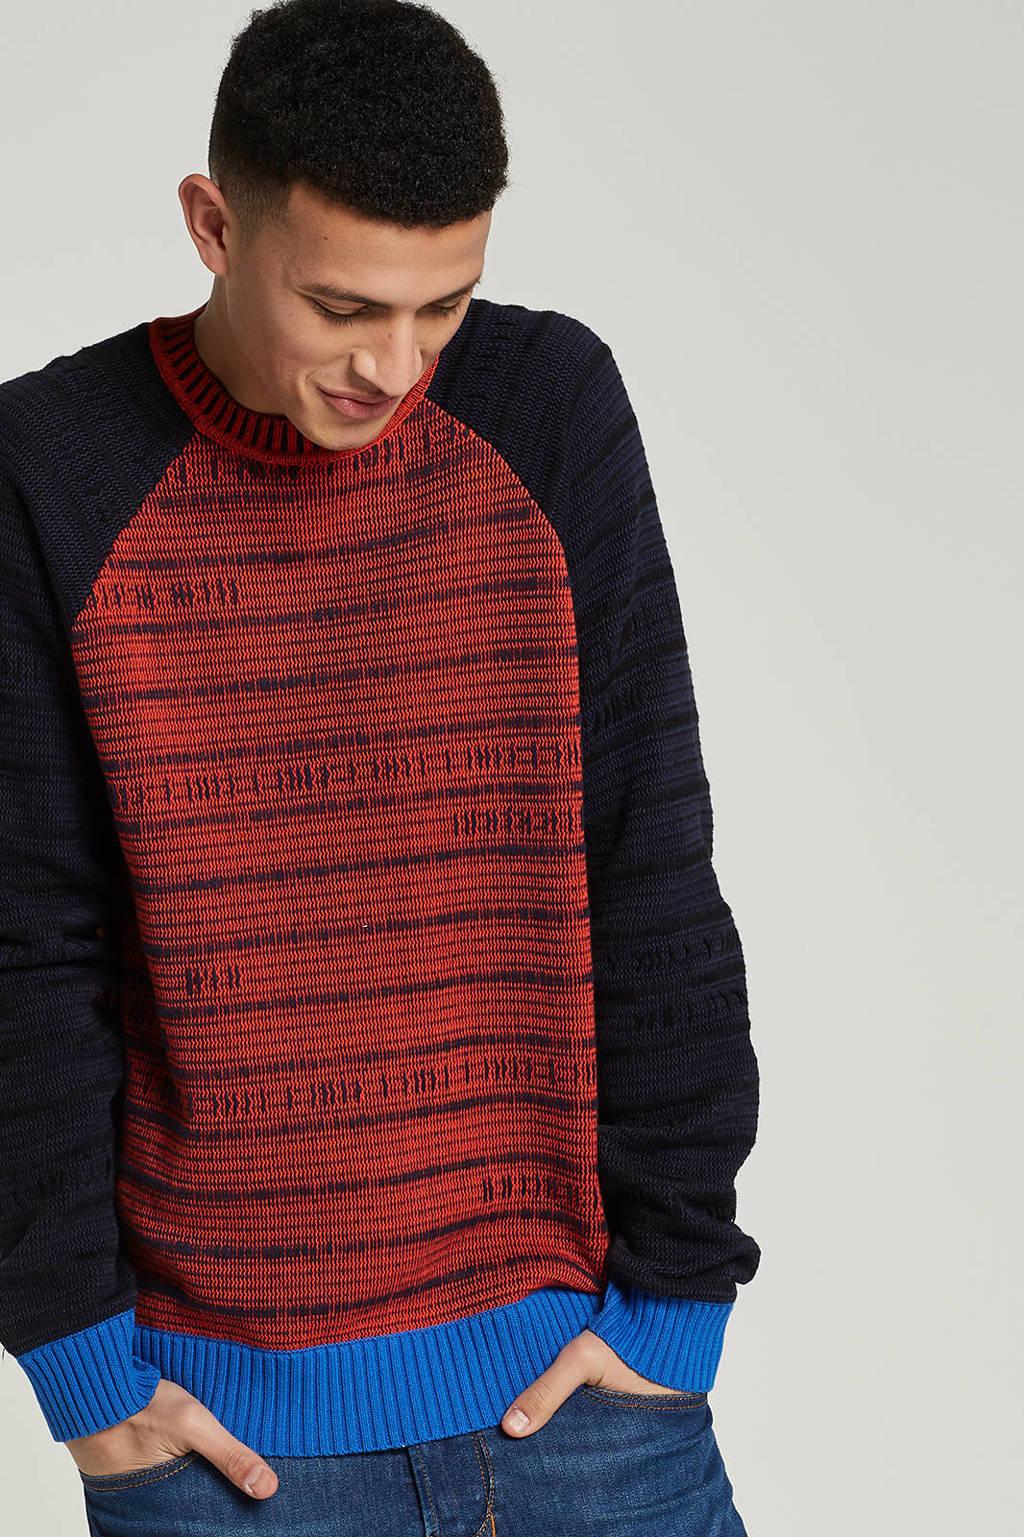 Diesel Jacky trui, Donkerblauw/blauw/rood